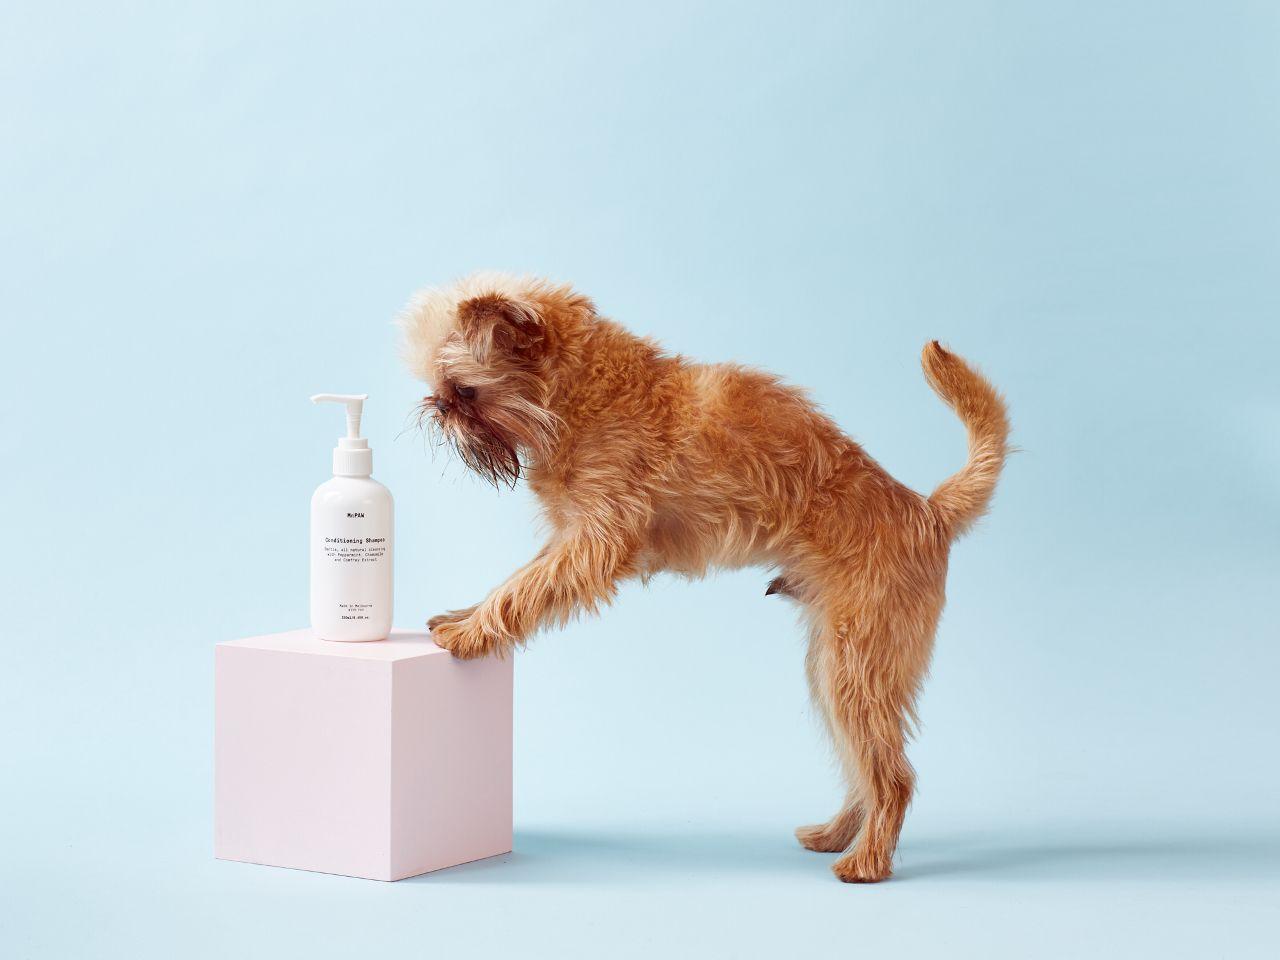 All Natural Vegan Dog Shampoo From Mr Paw In 2020 Vegan Dog Dog Shampoo Dogs